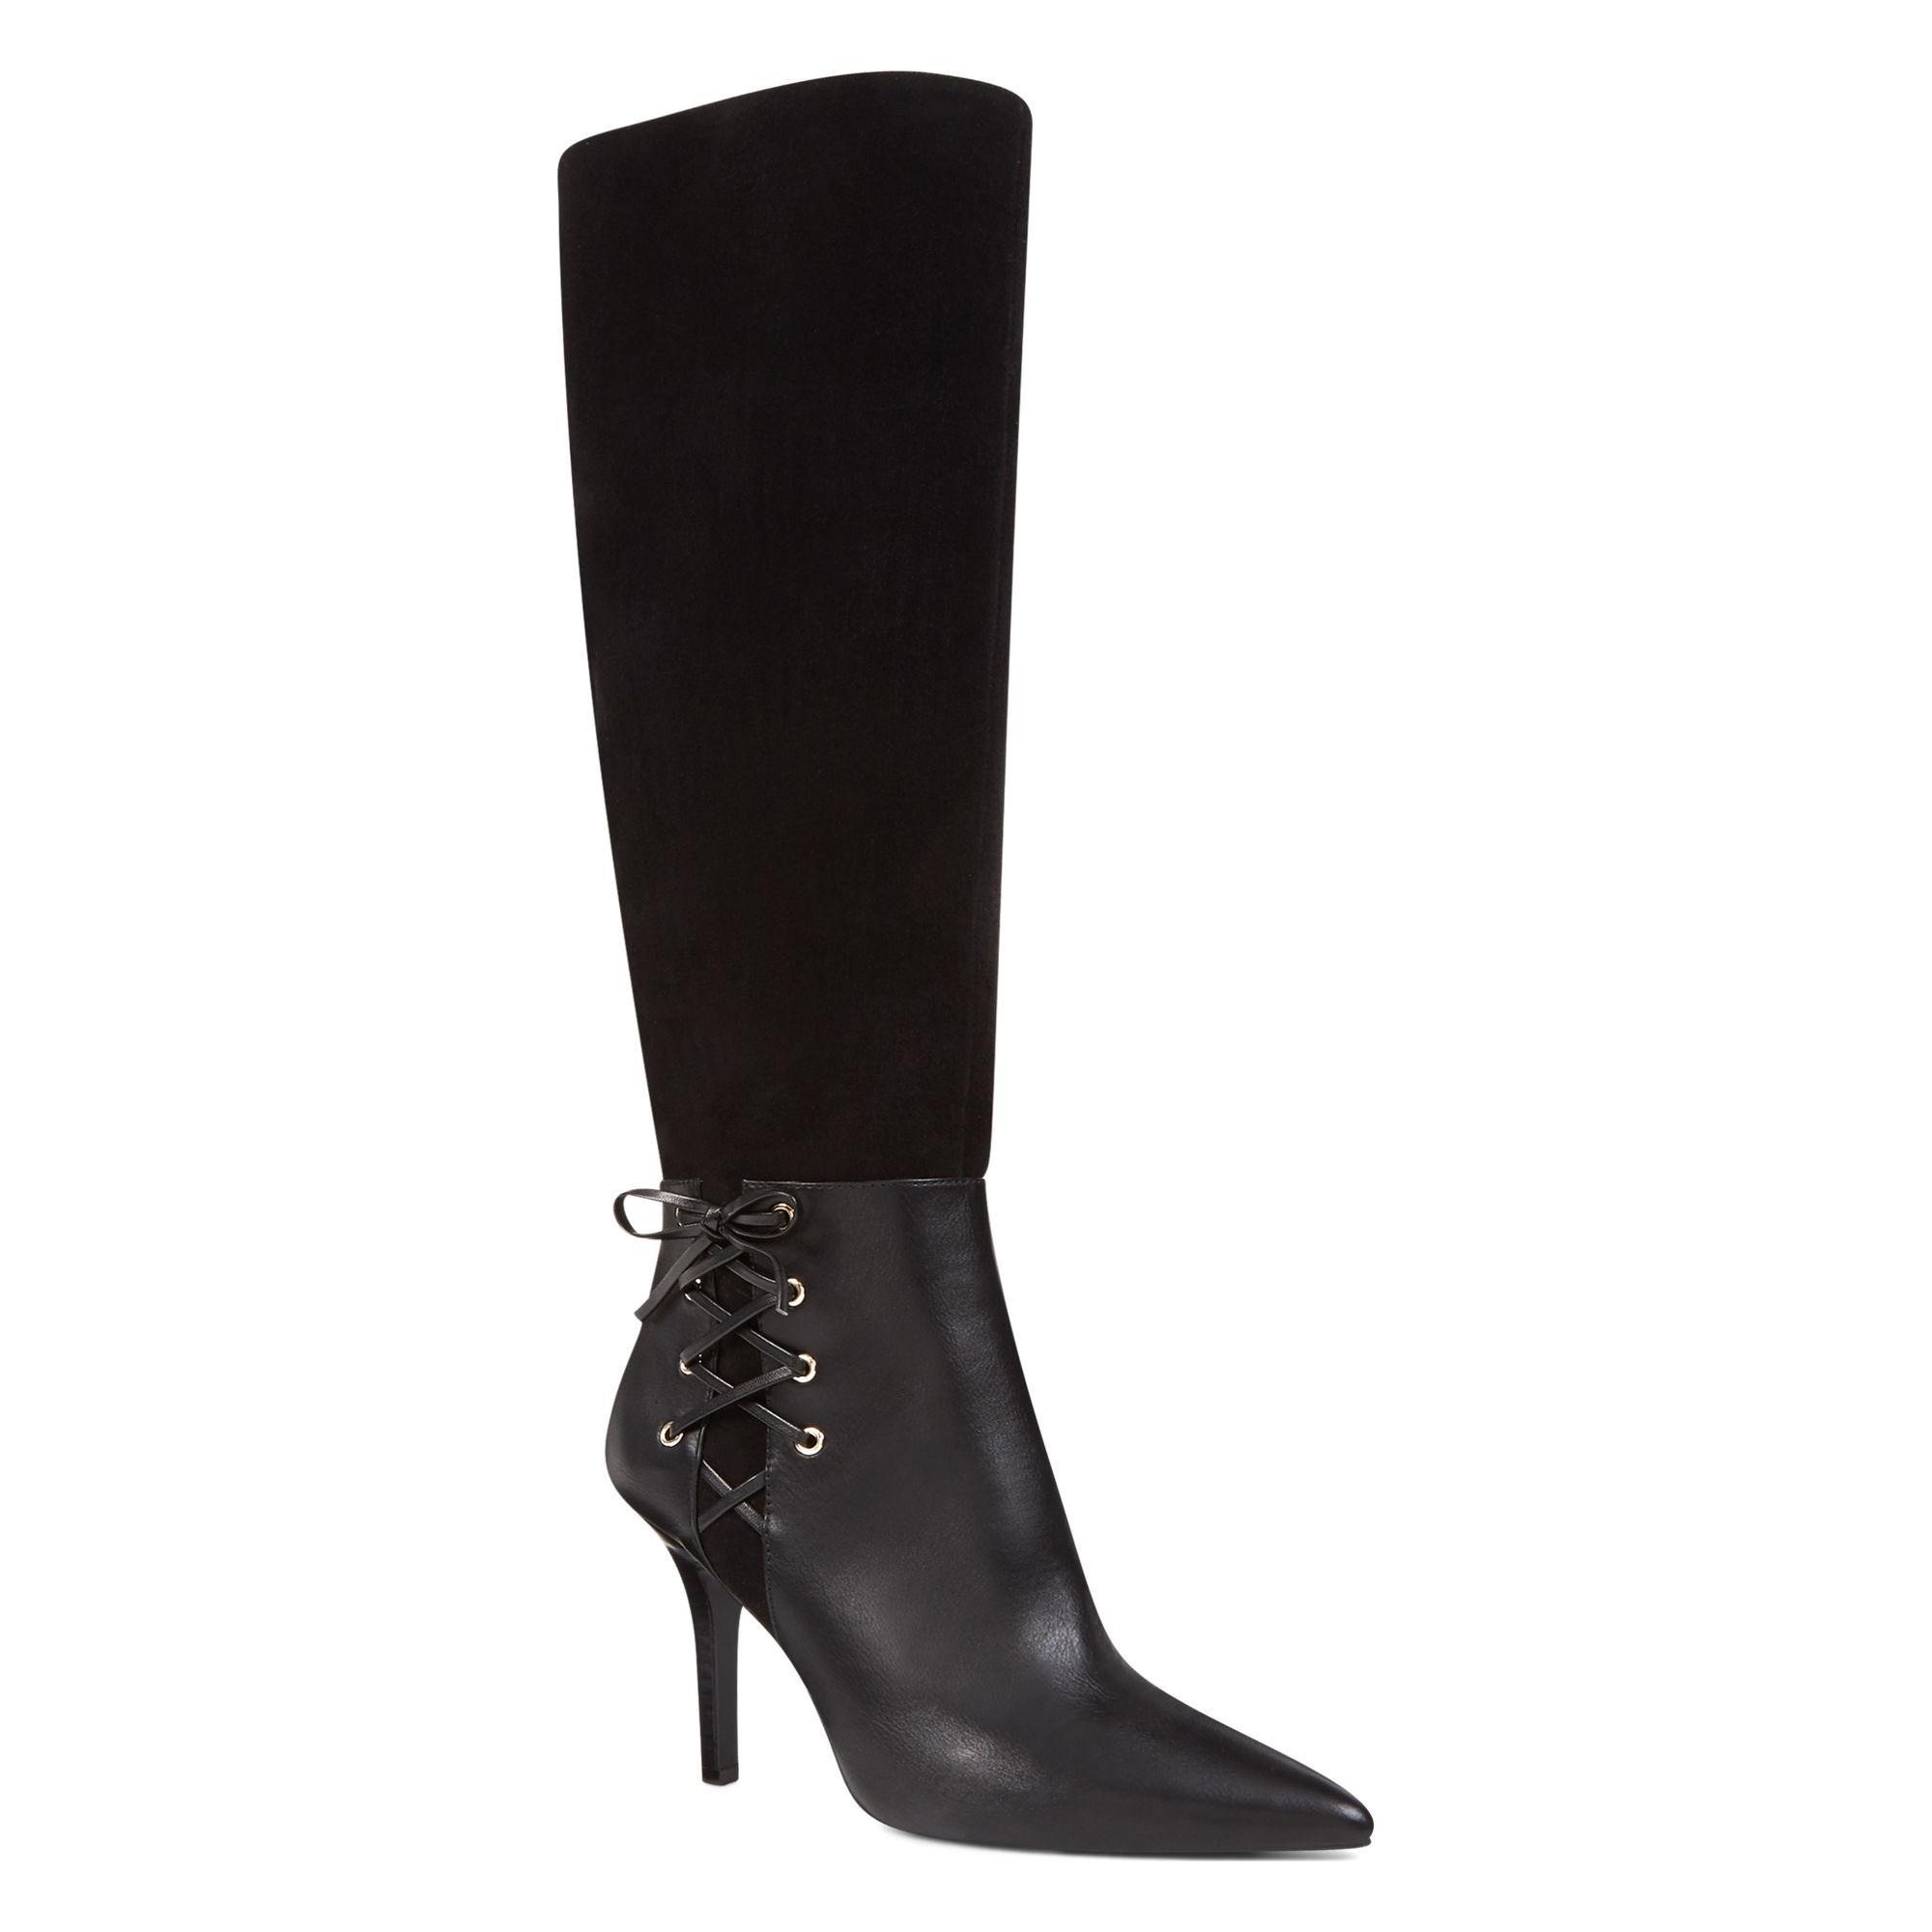 Nine West's Jeliza Tall Boots